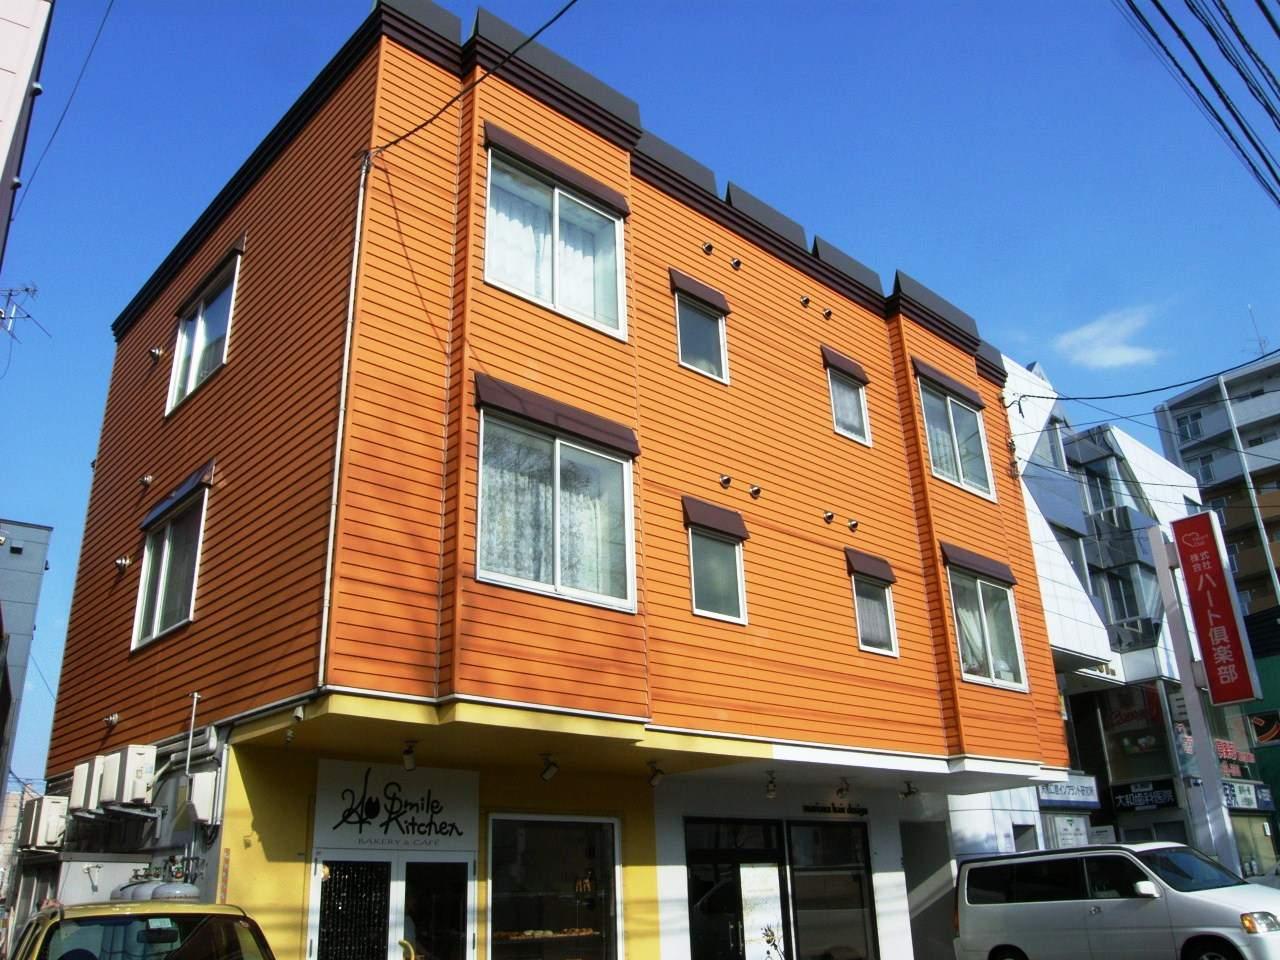 北海道札幌市厚別区、新札幌駅徒歩10分の築14年 3階建の賃貸アパート